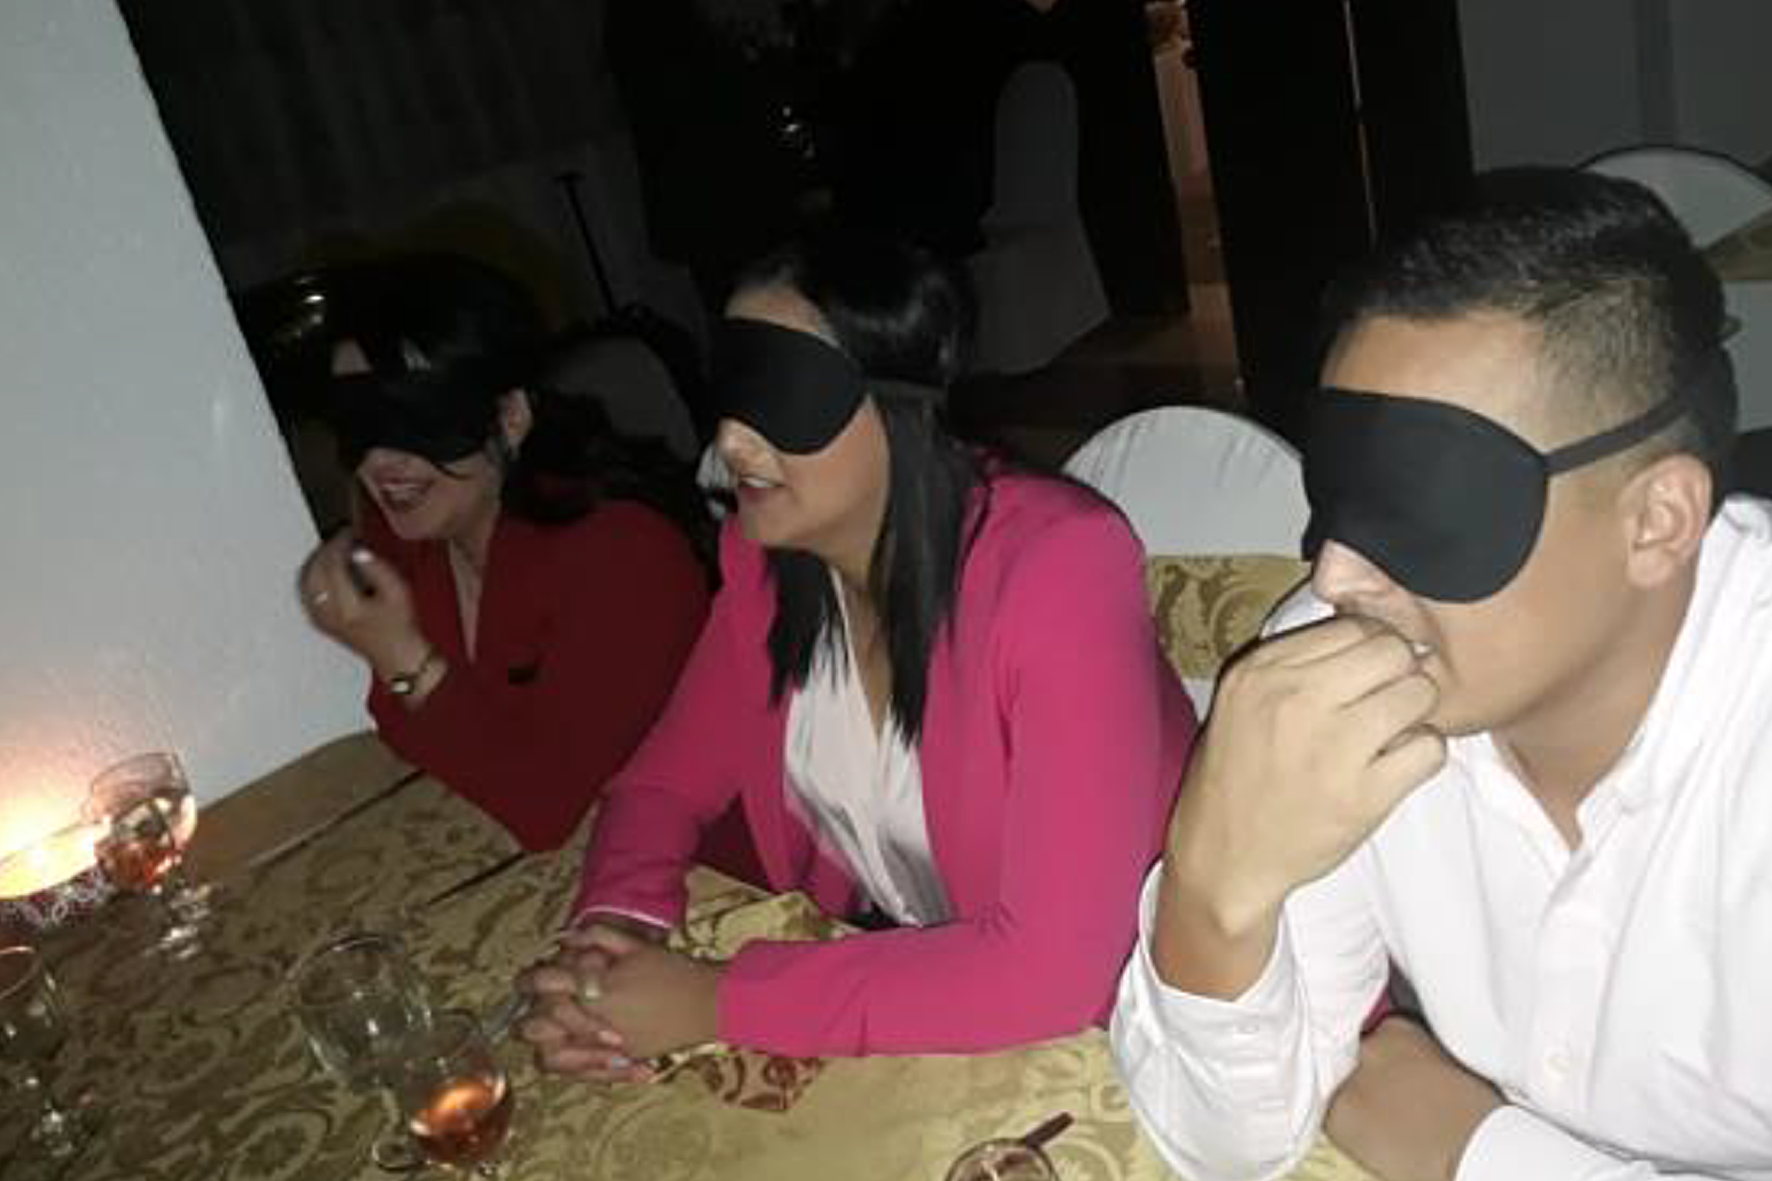 cena-a-ciegas-asistentes